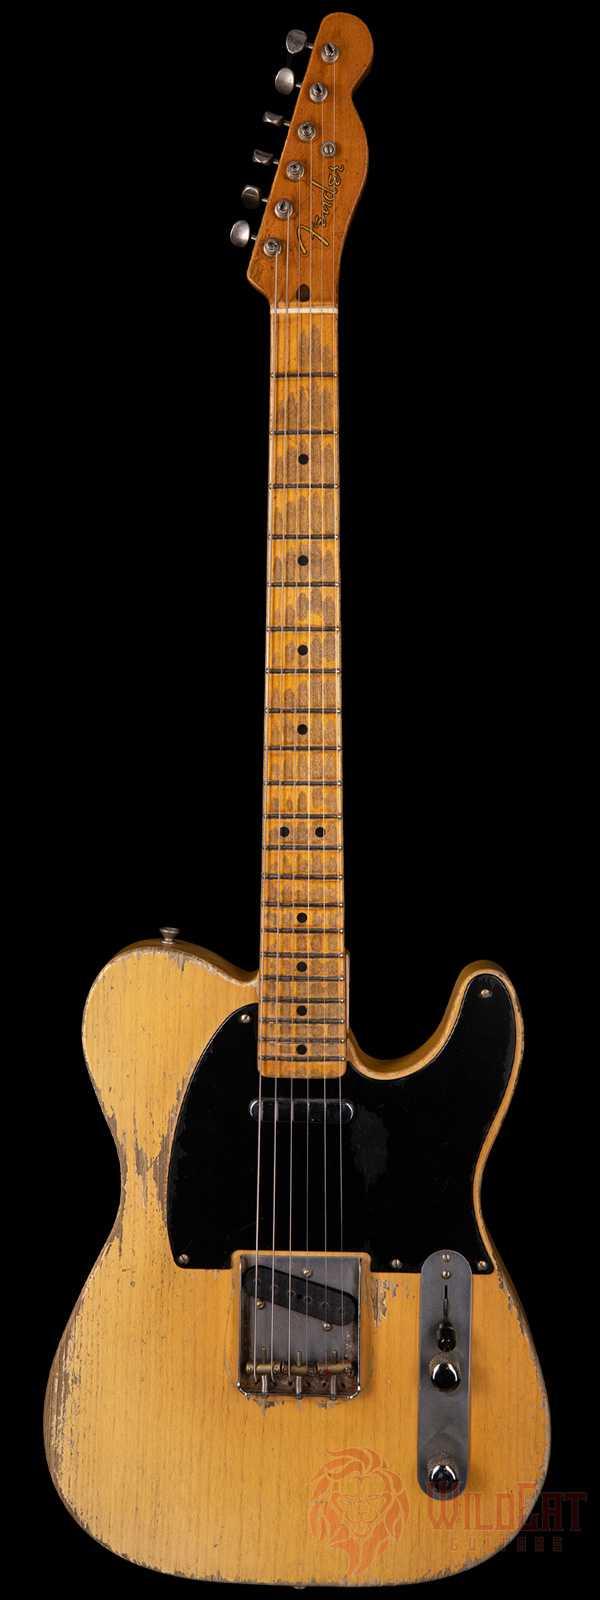 Fender Custom Shop Masterbuilt Dale Wilson Nocaster Smoked Nocaster Blonde Heavy Relic